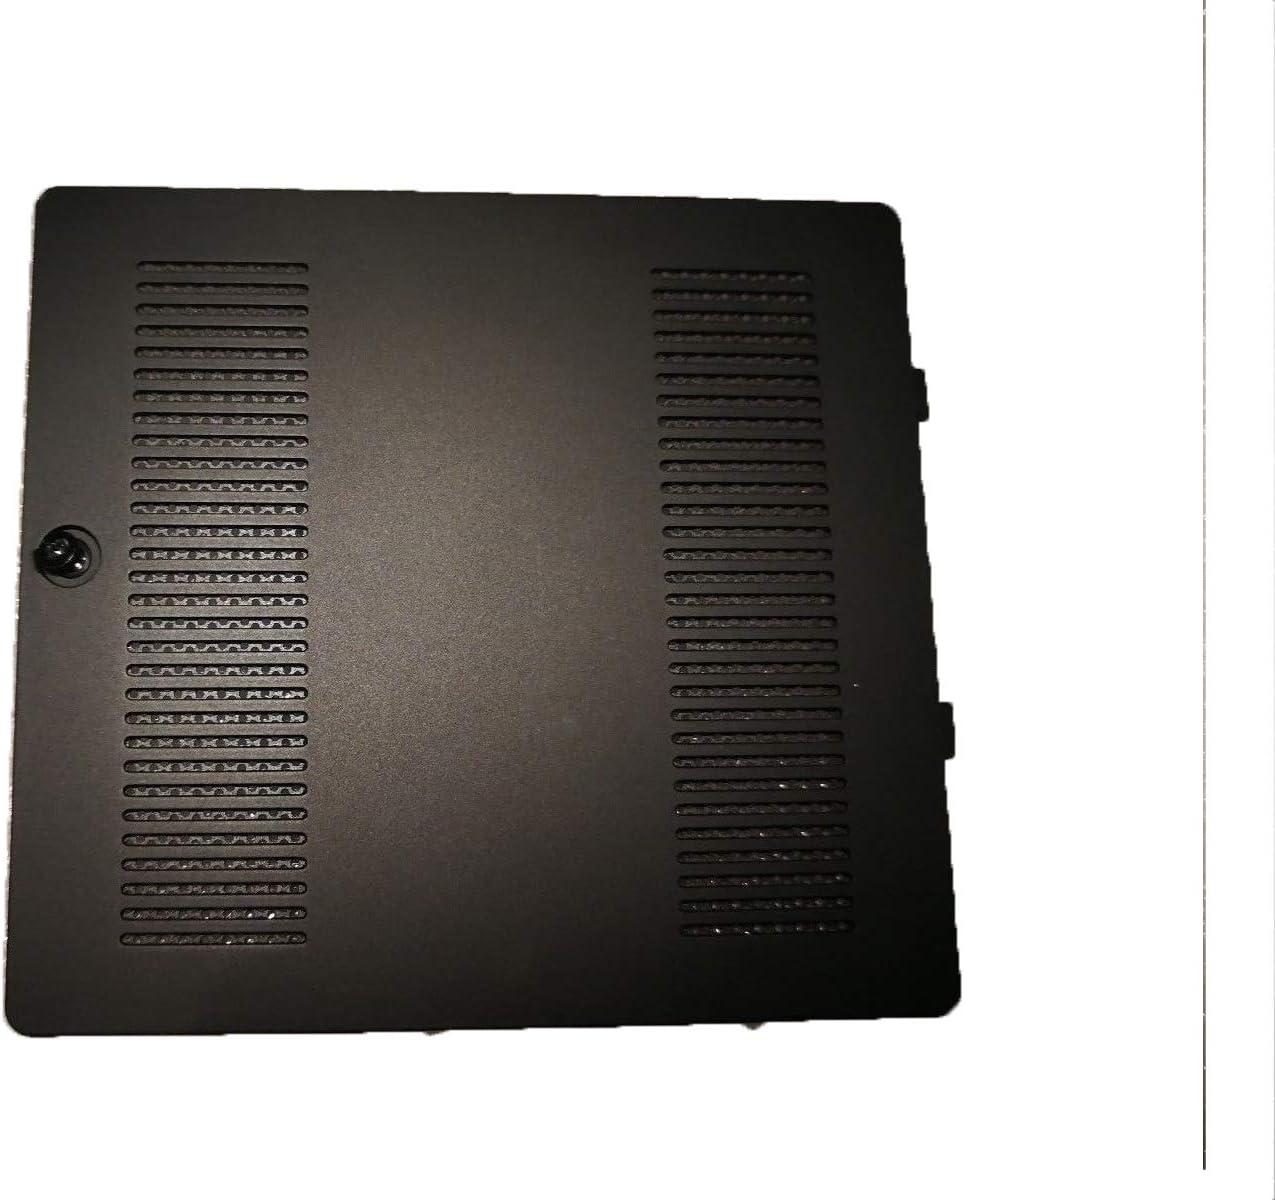 GAOCHENG Laptop Bottom Door Cover for DELL Inspiron 14Z 5423 P35G Black 60.4UV11.002 09RRG2 9RRG2 Memory Cover New and Original